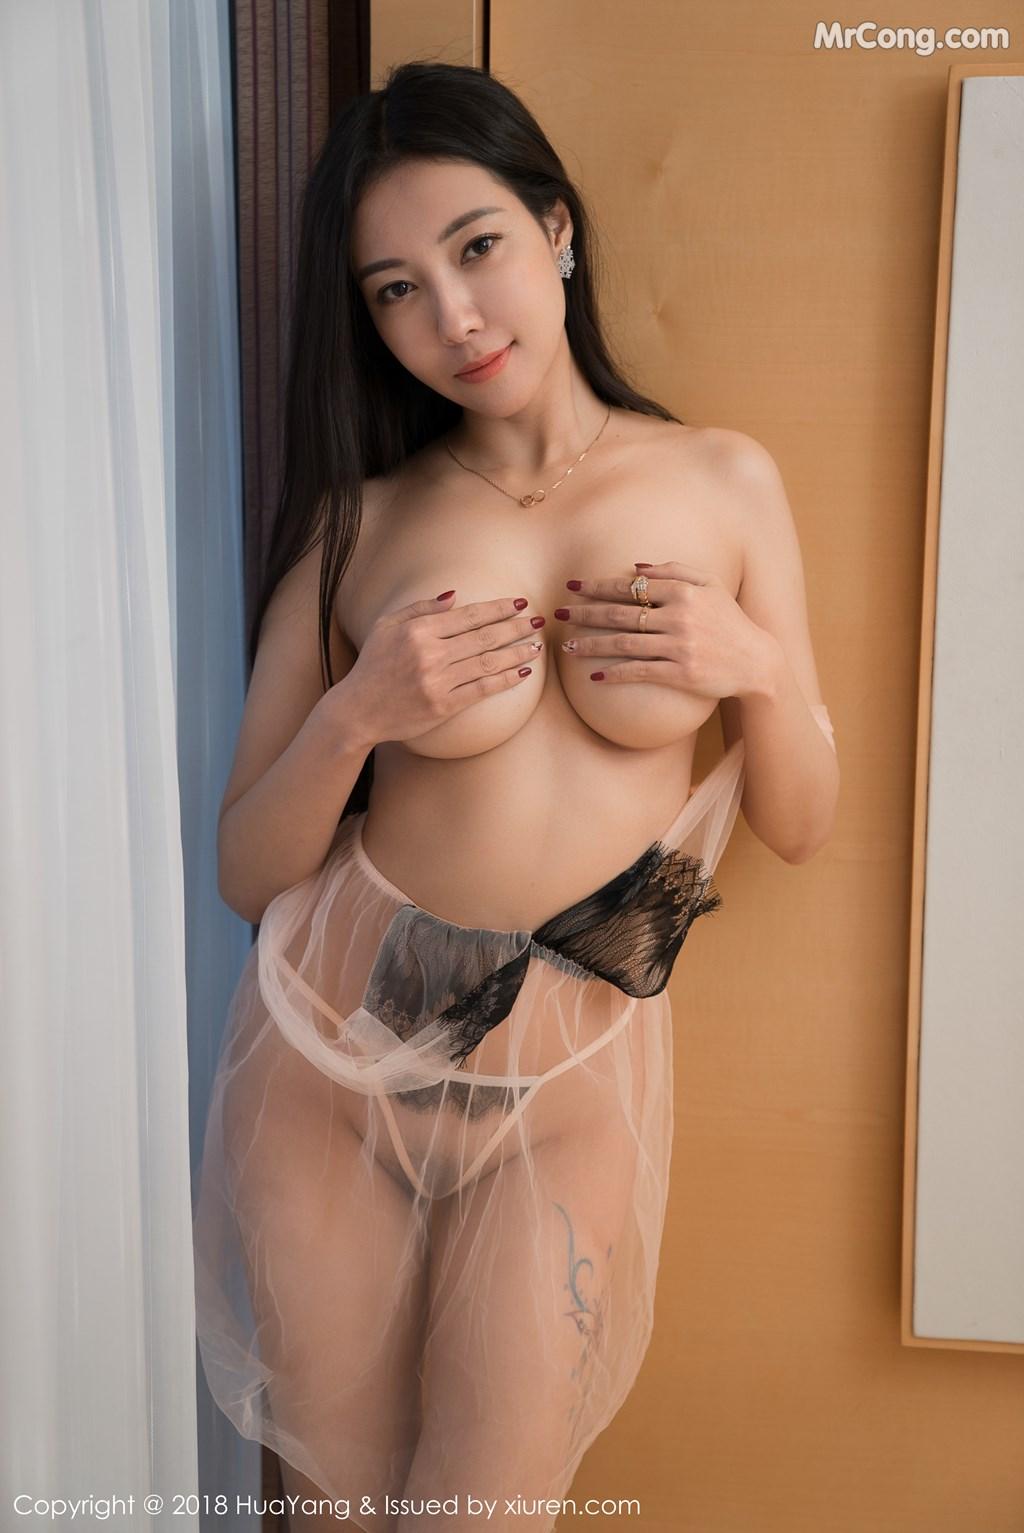 Image HuaYang-2018-01-26-Vol.028-Victoria-Guo-Er-MrCong.com-010 in post HuaYang 2018-01-26 Vol.028: Người mẫu Victoria (果儿) (41 ảnh)